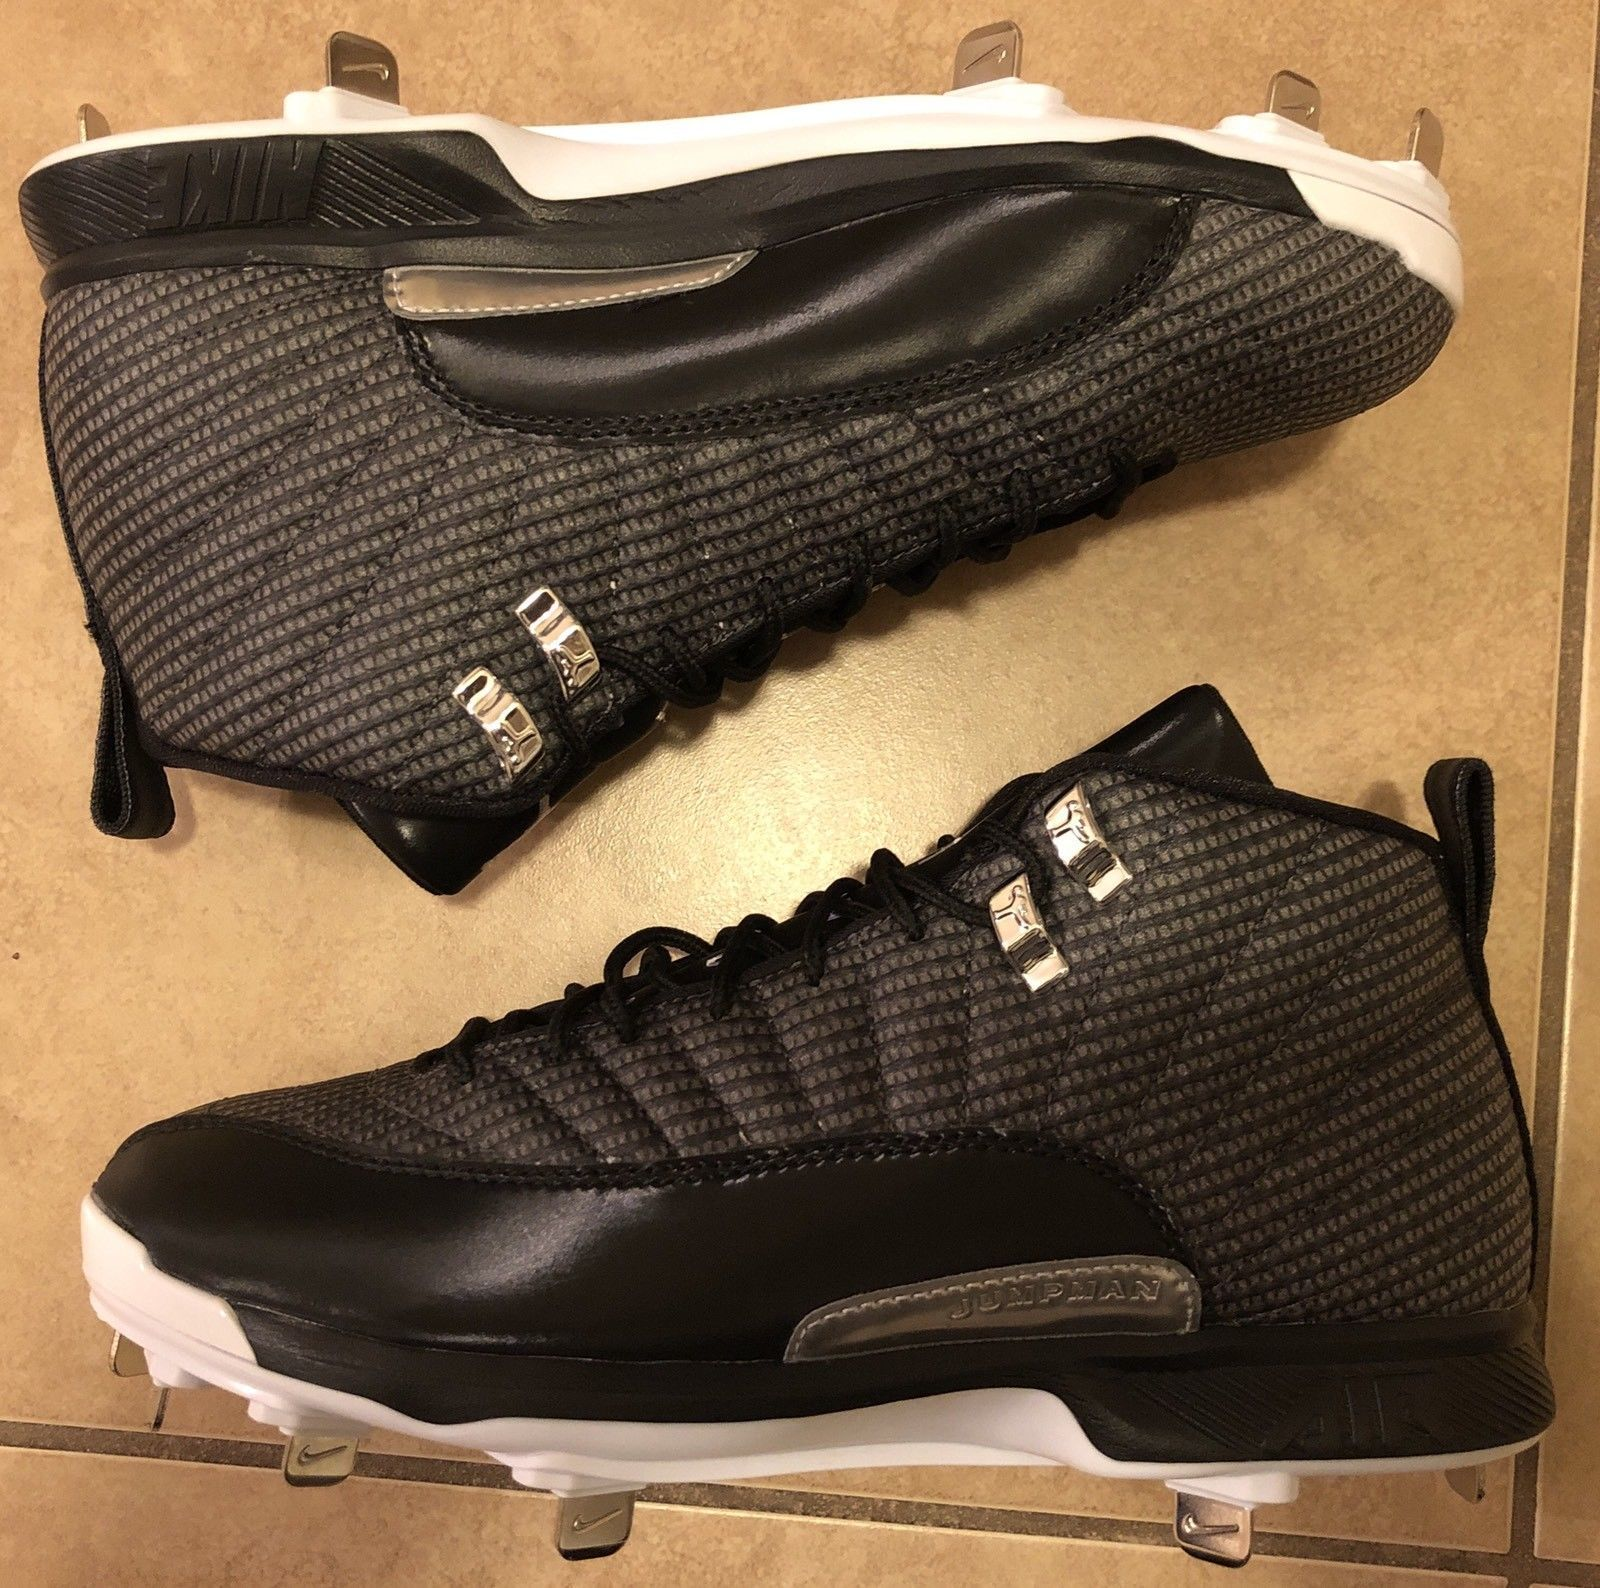 a18200101c7 ... Nike Jordan 12 XII Retro Metal Baseball Cleats Men s Size 8 Black  854567-010 ...